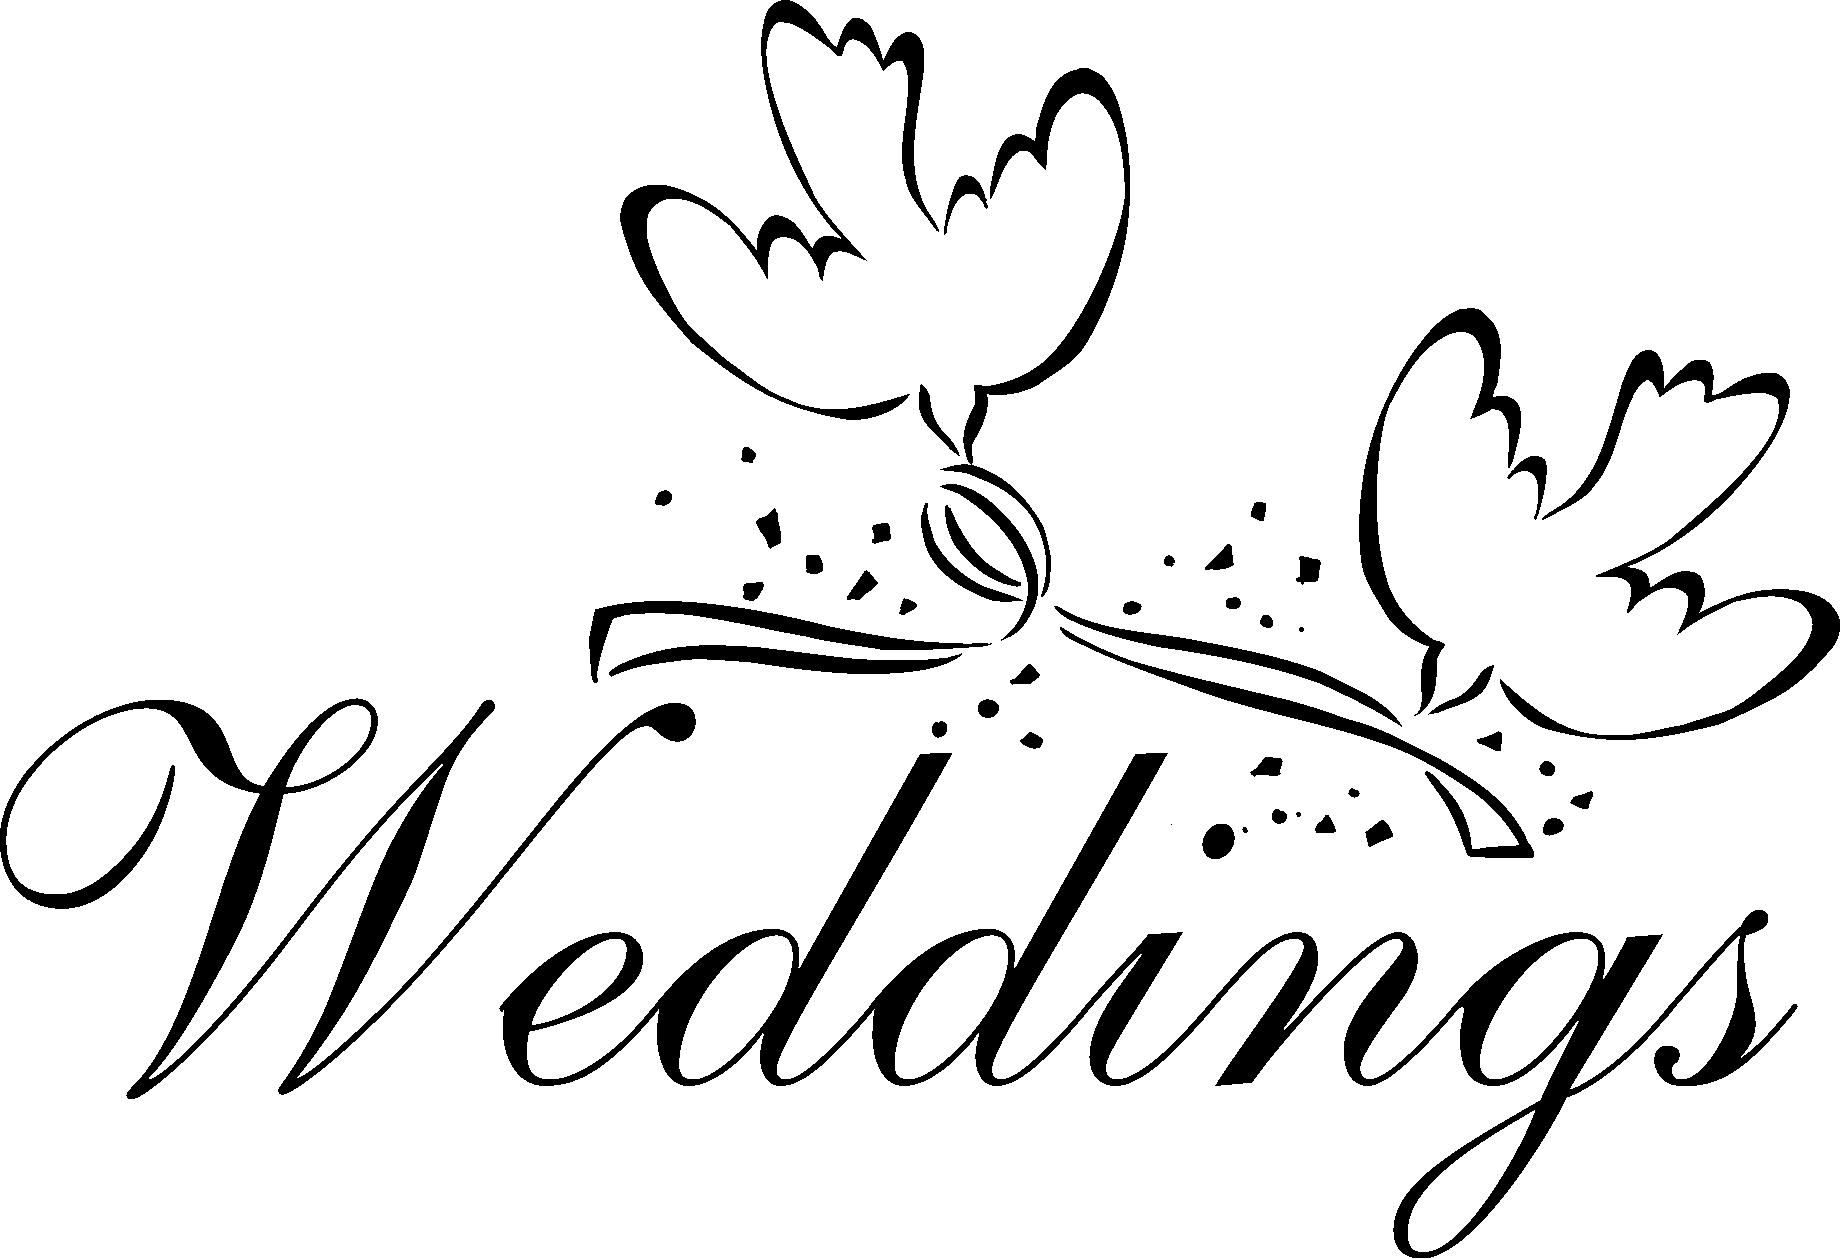 hight resolution of png wedding clipart wedding c wedding clipart